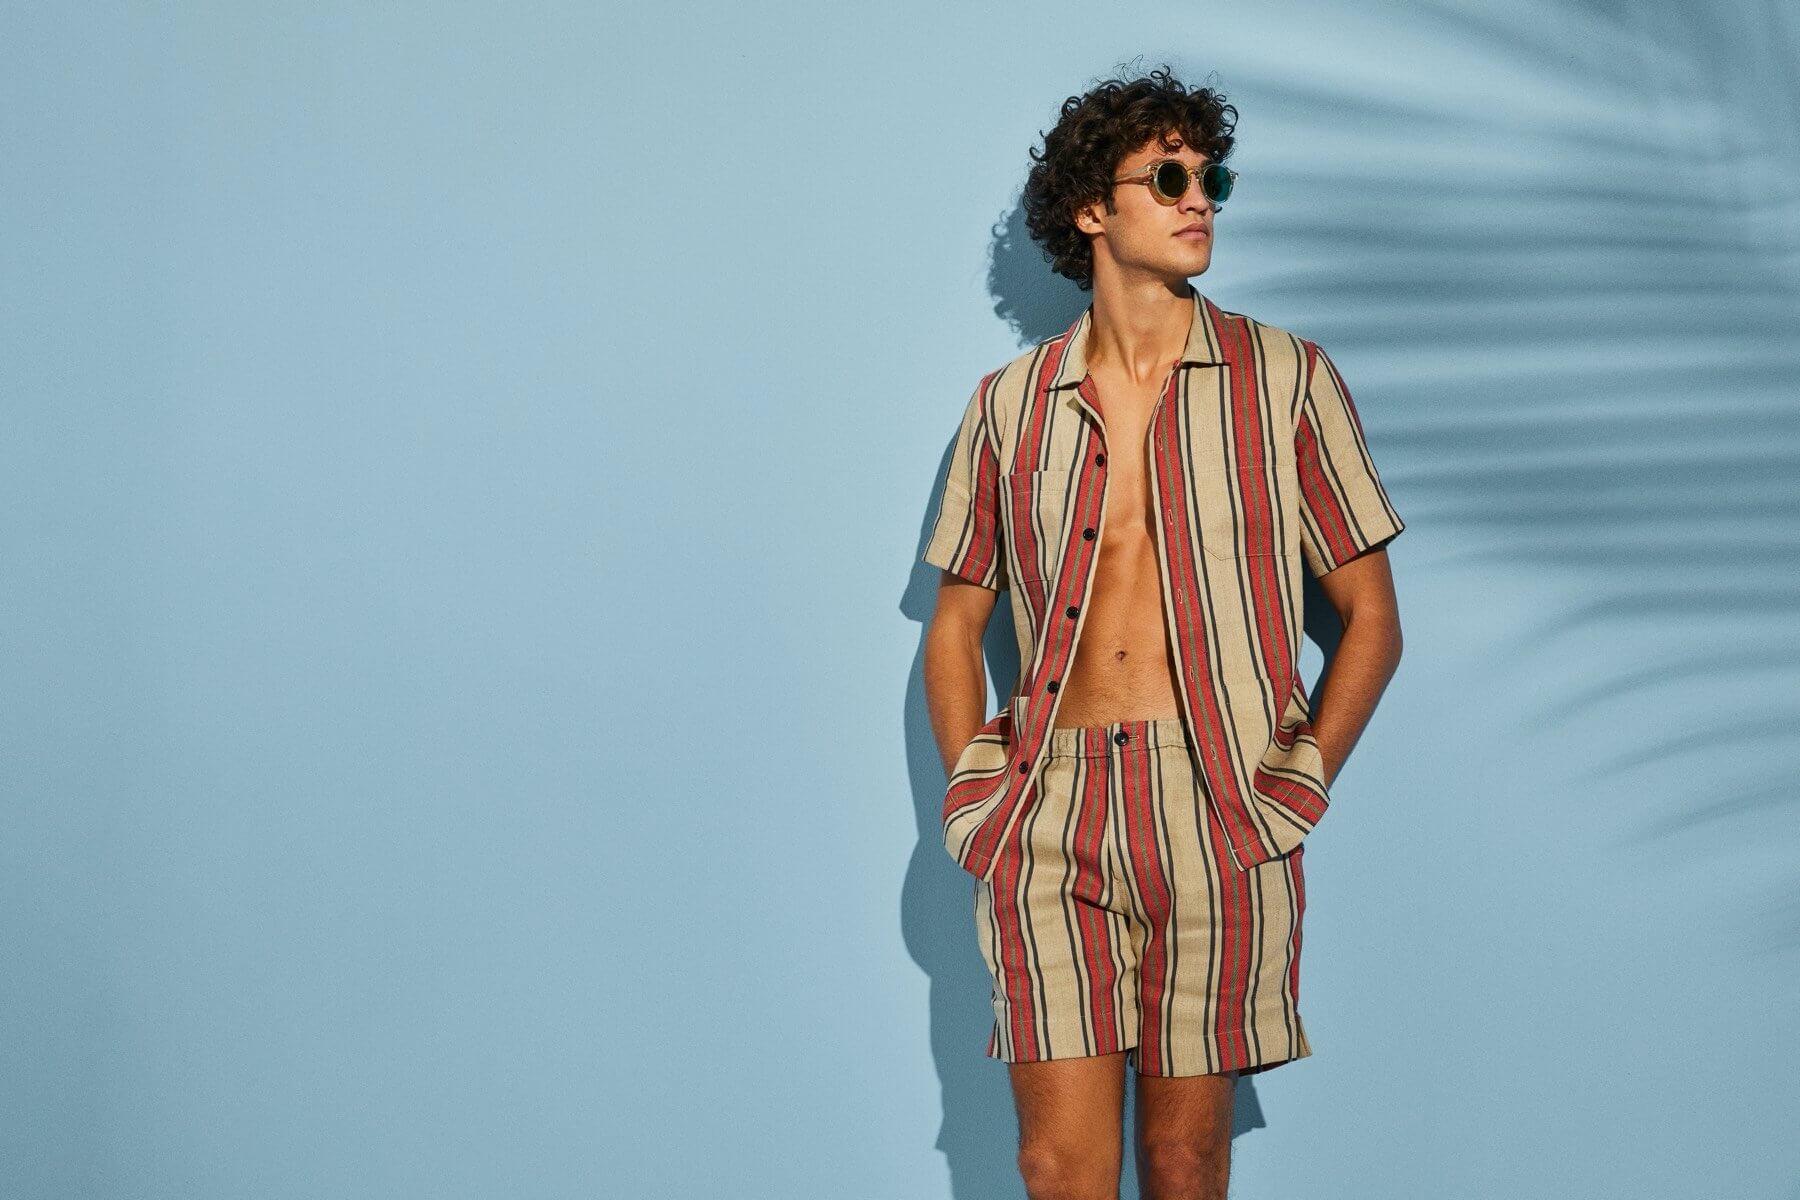 Todd Snyder Linen Cotton Bahama Shirt and Shorts